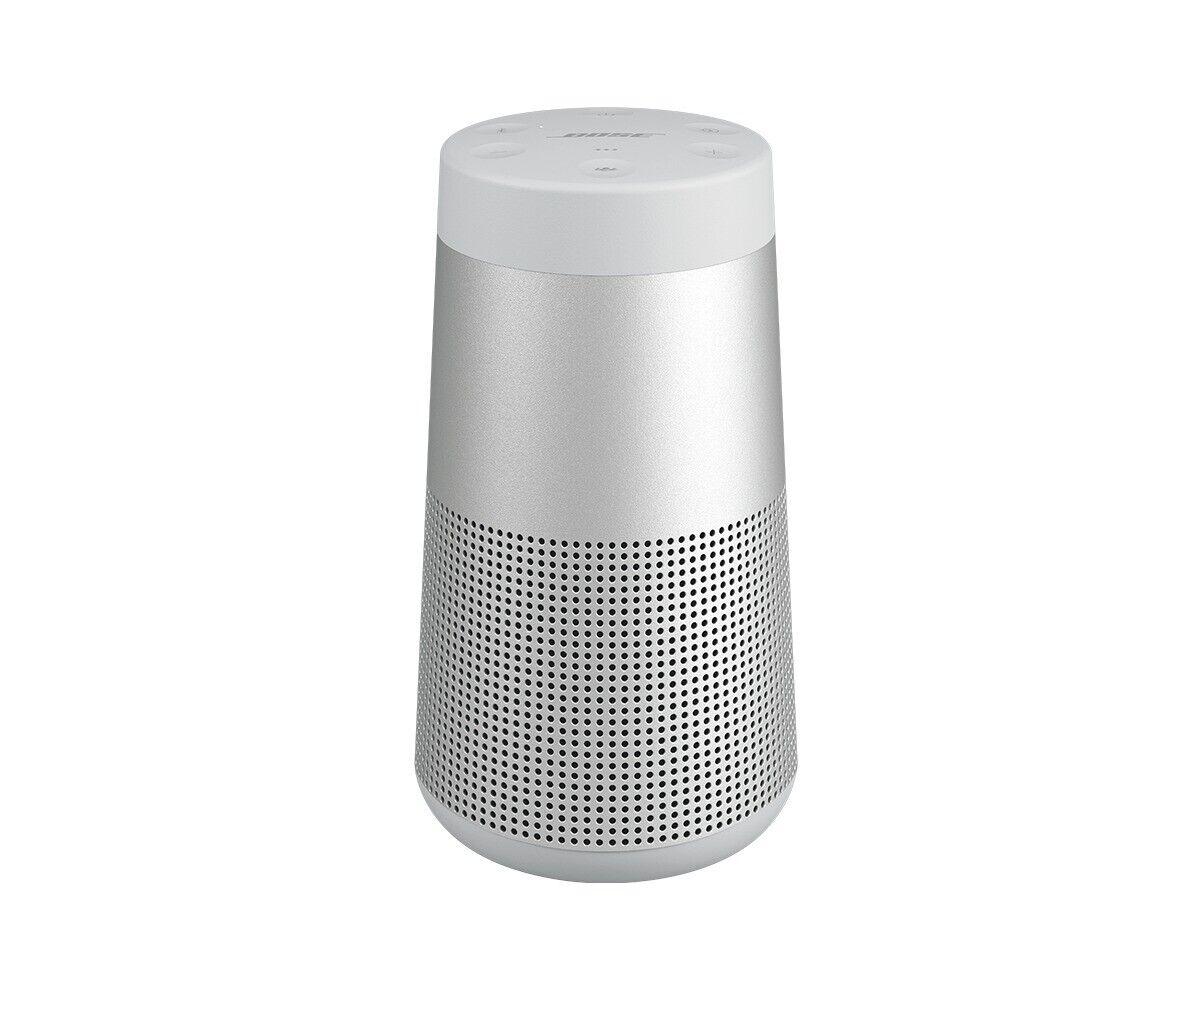 Bose SoundLink Revolve Bluetooth Speaker Luxe Silver